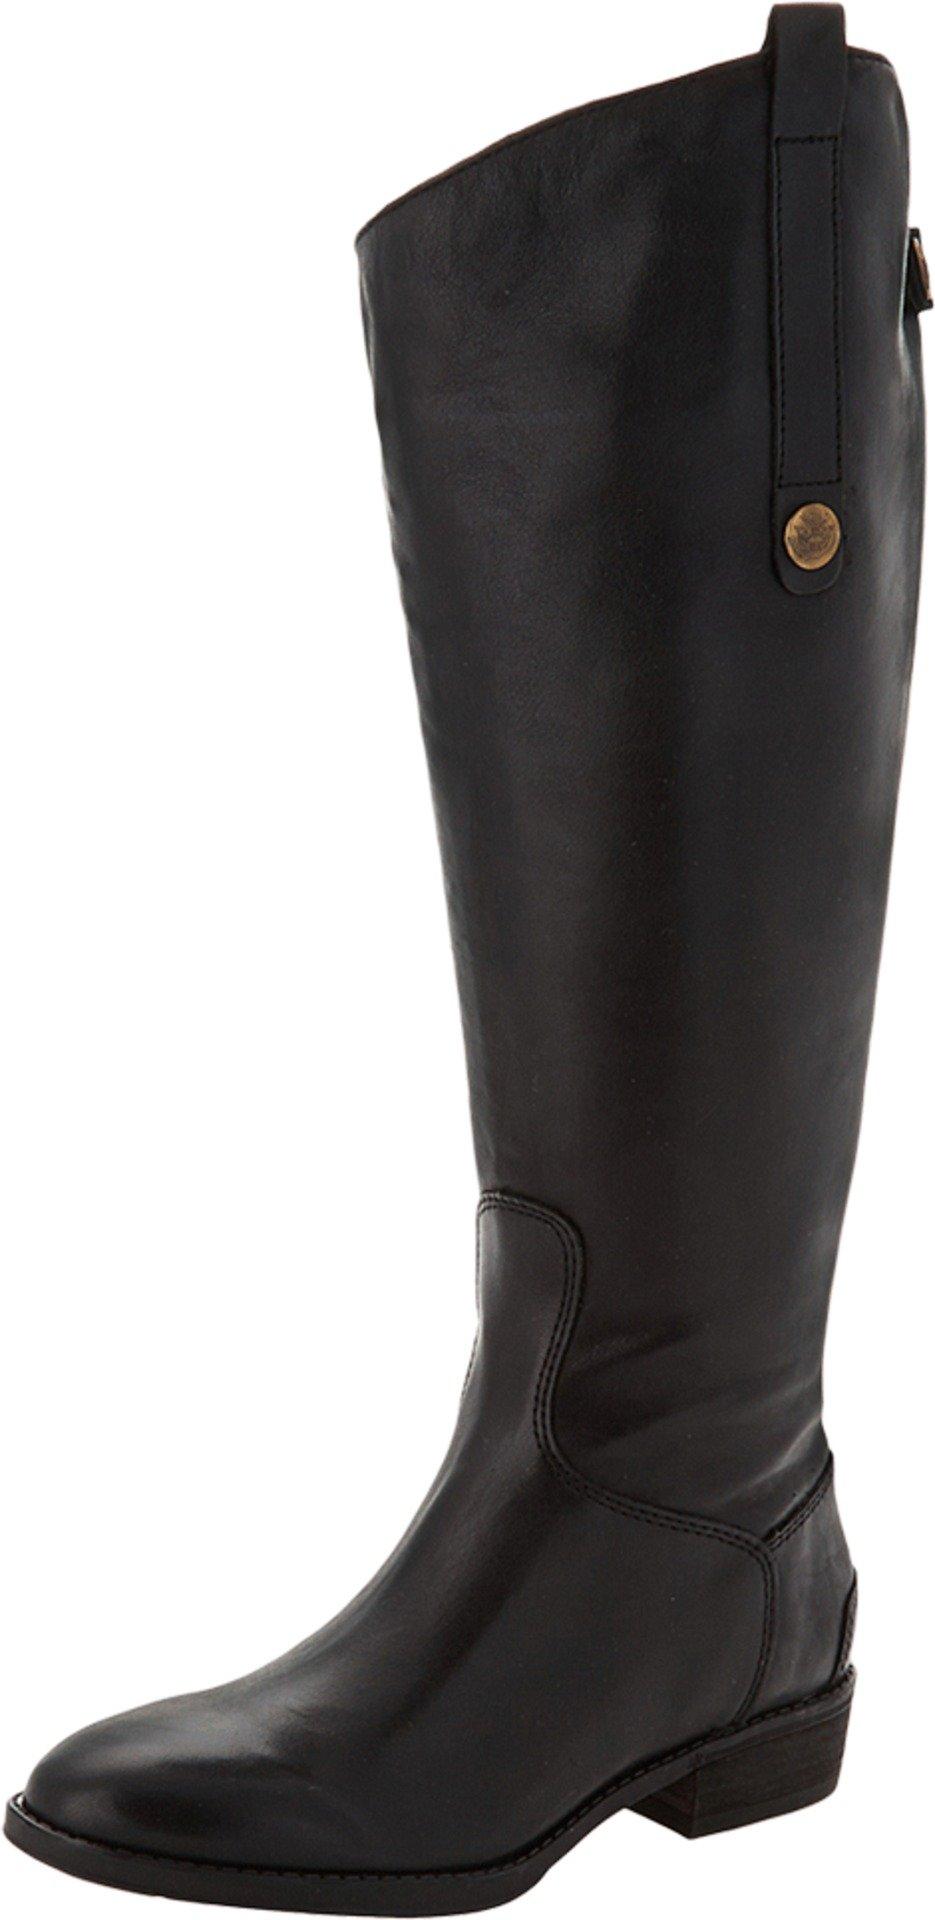 Sam Edelman Women's Penny 2 Wide Shaft Riding Boot, Black Leather, 8.5 M US